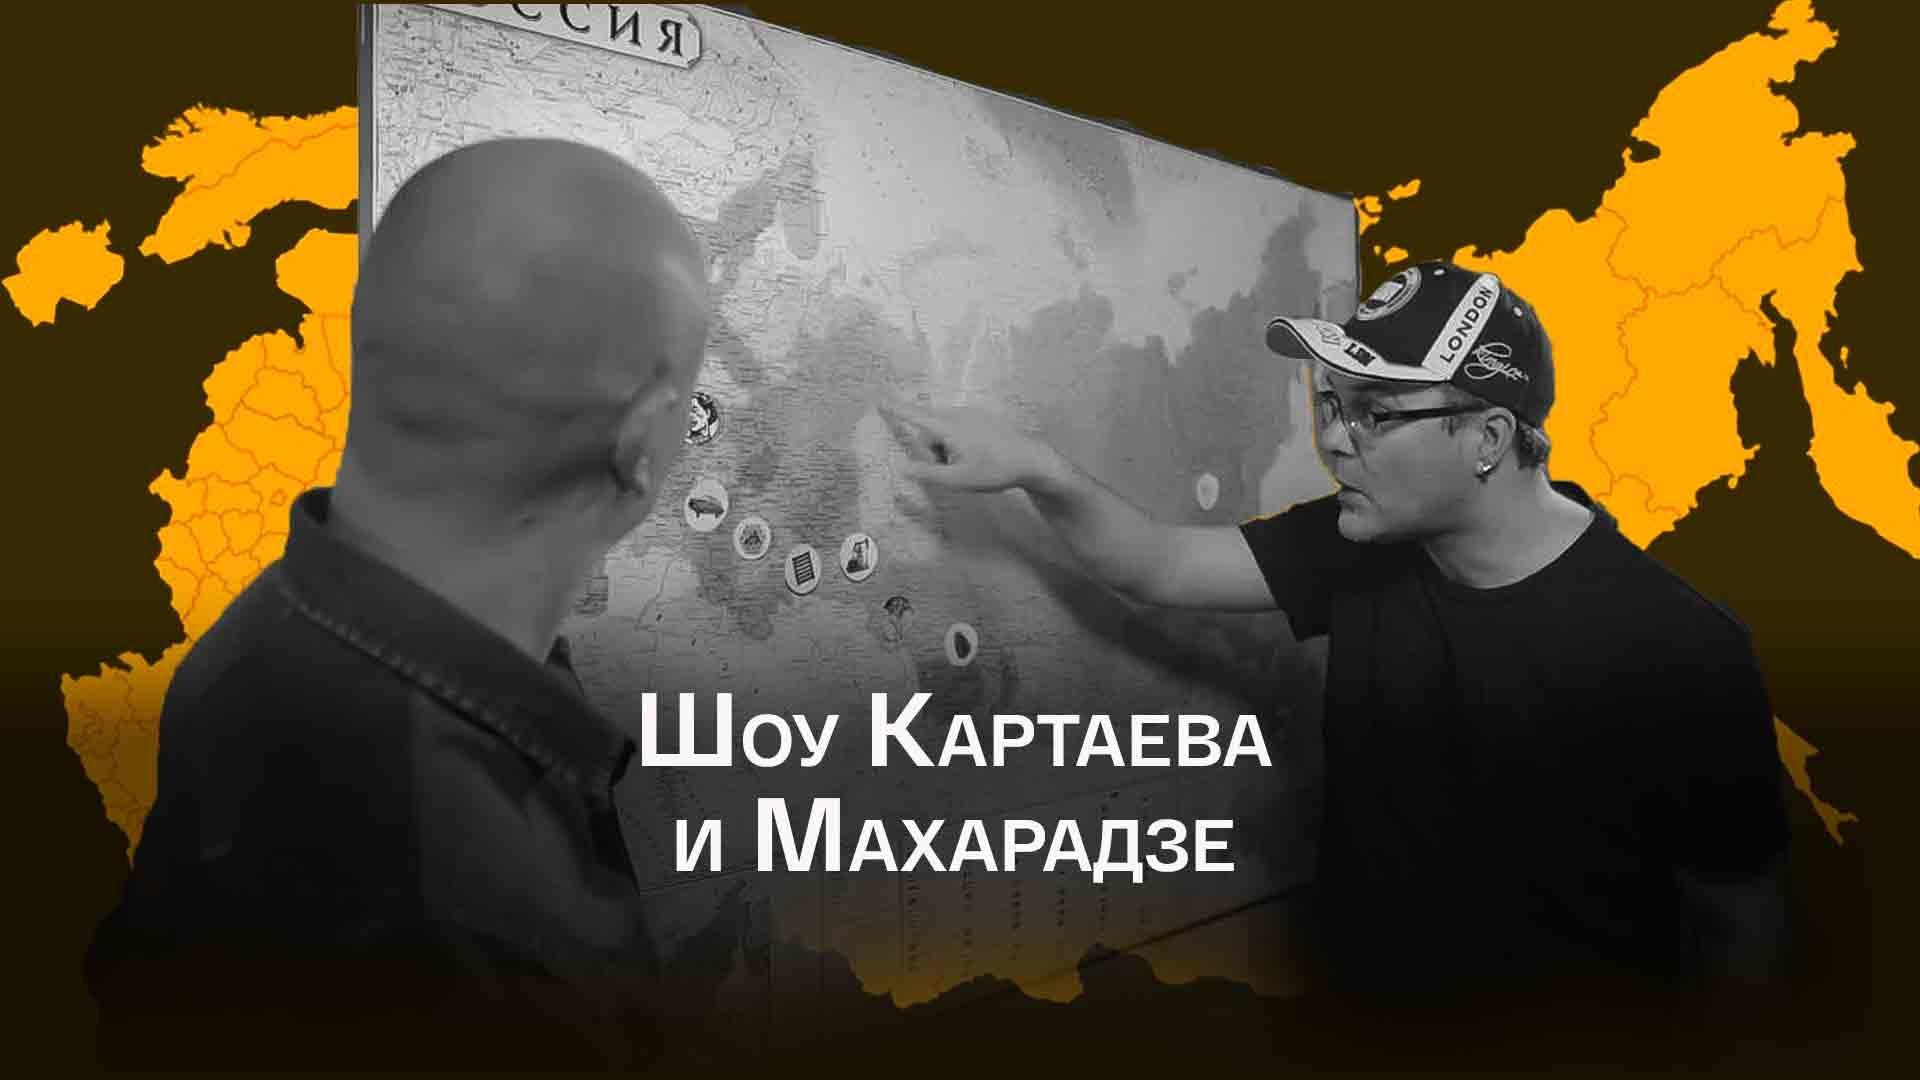 Шоу Картаева и Махарадзе